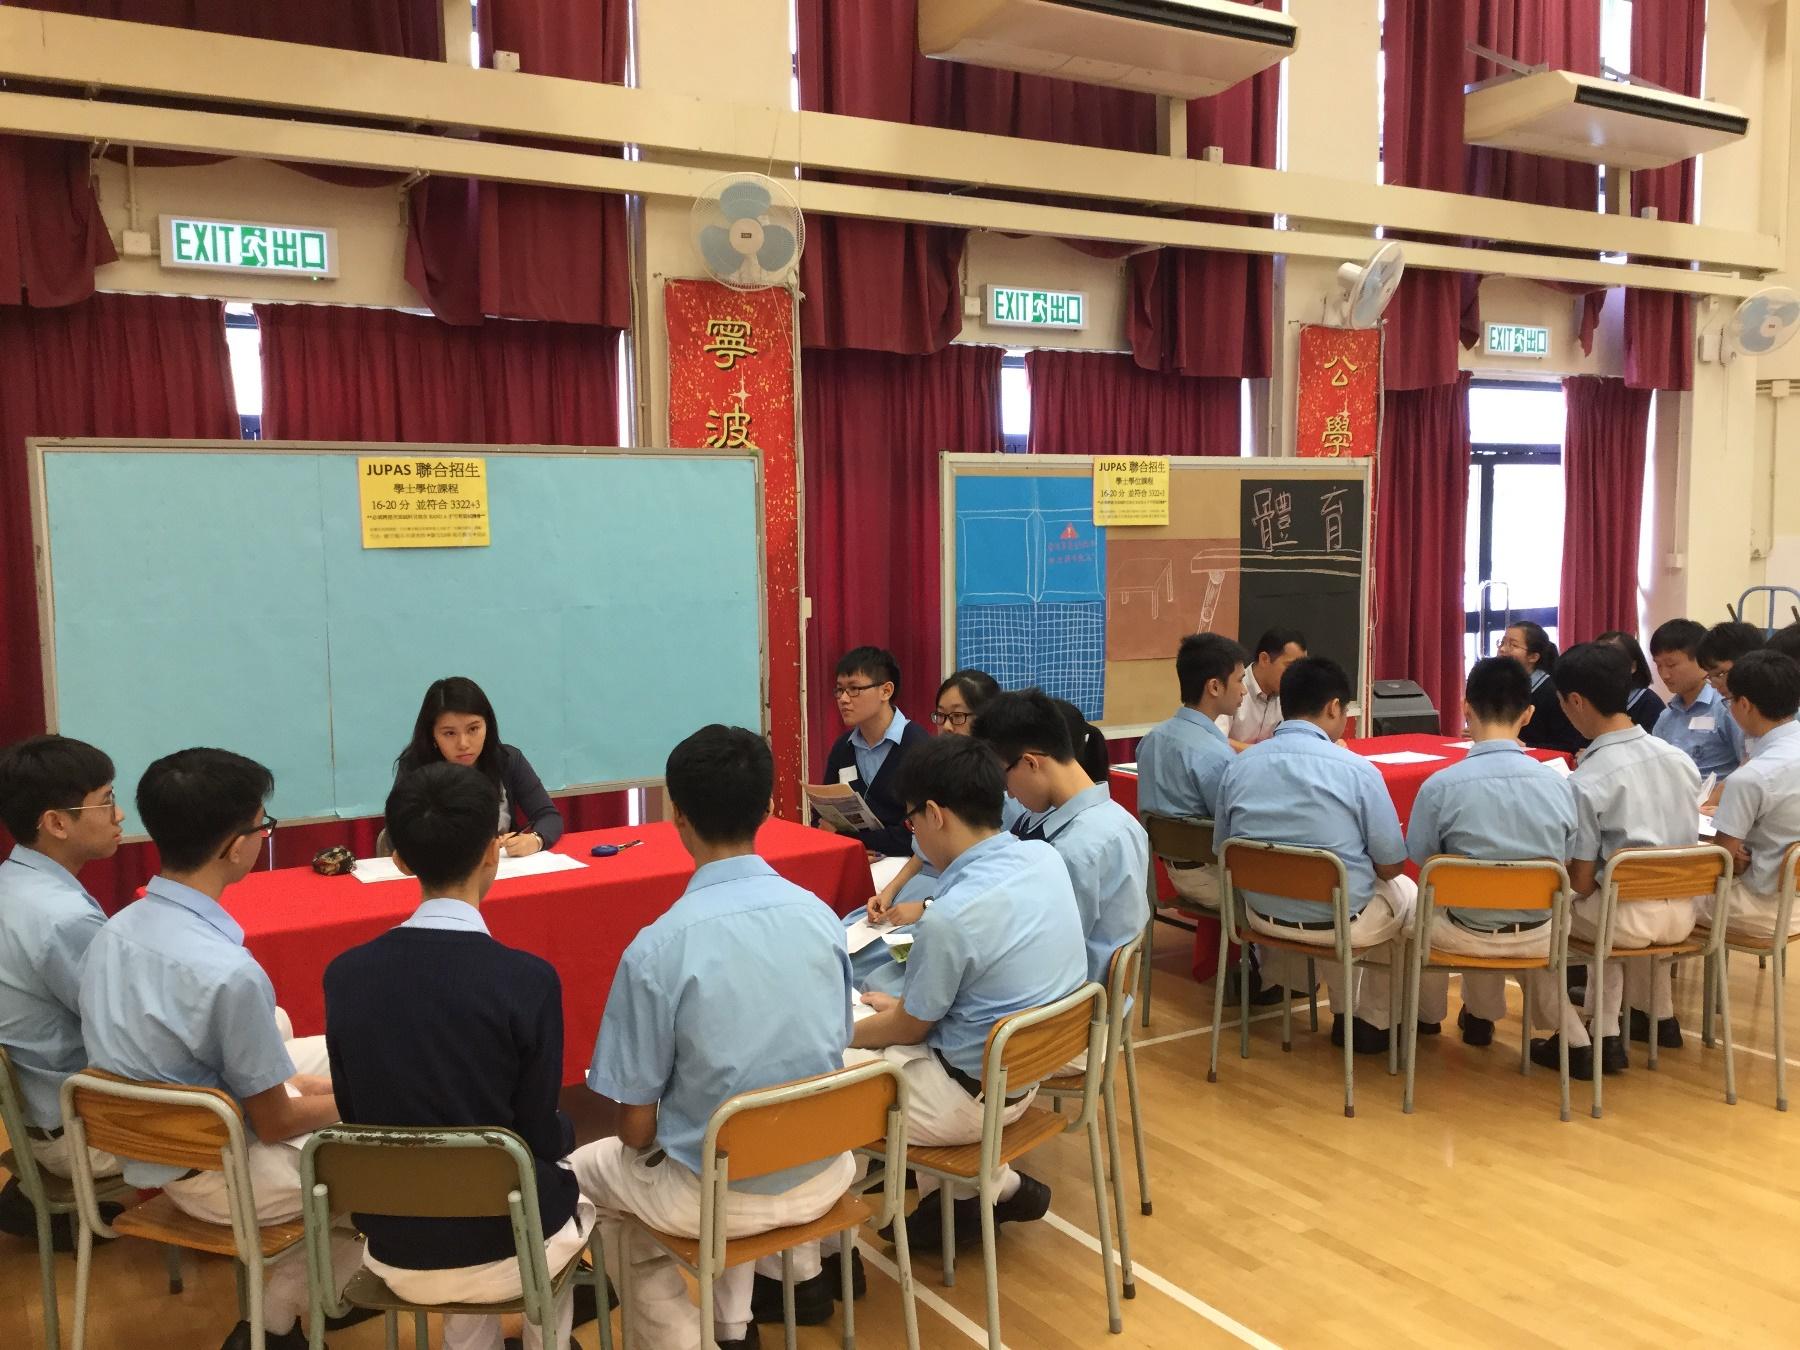 http://npc.edu.hk/sites/default/files/img_0366.jpg